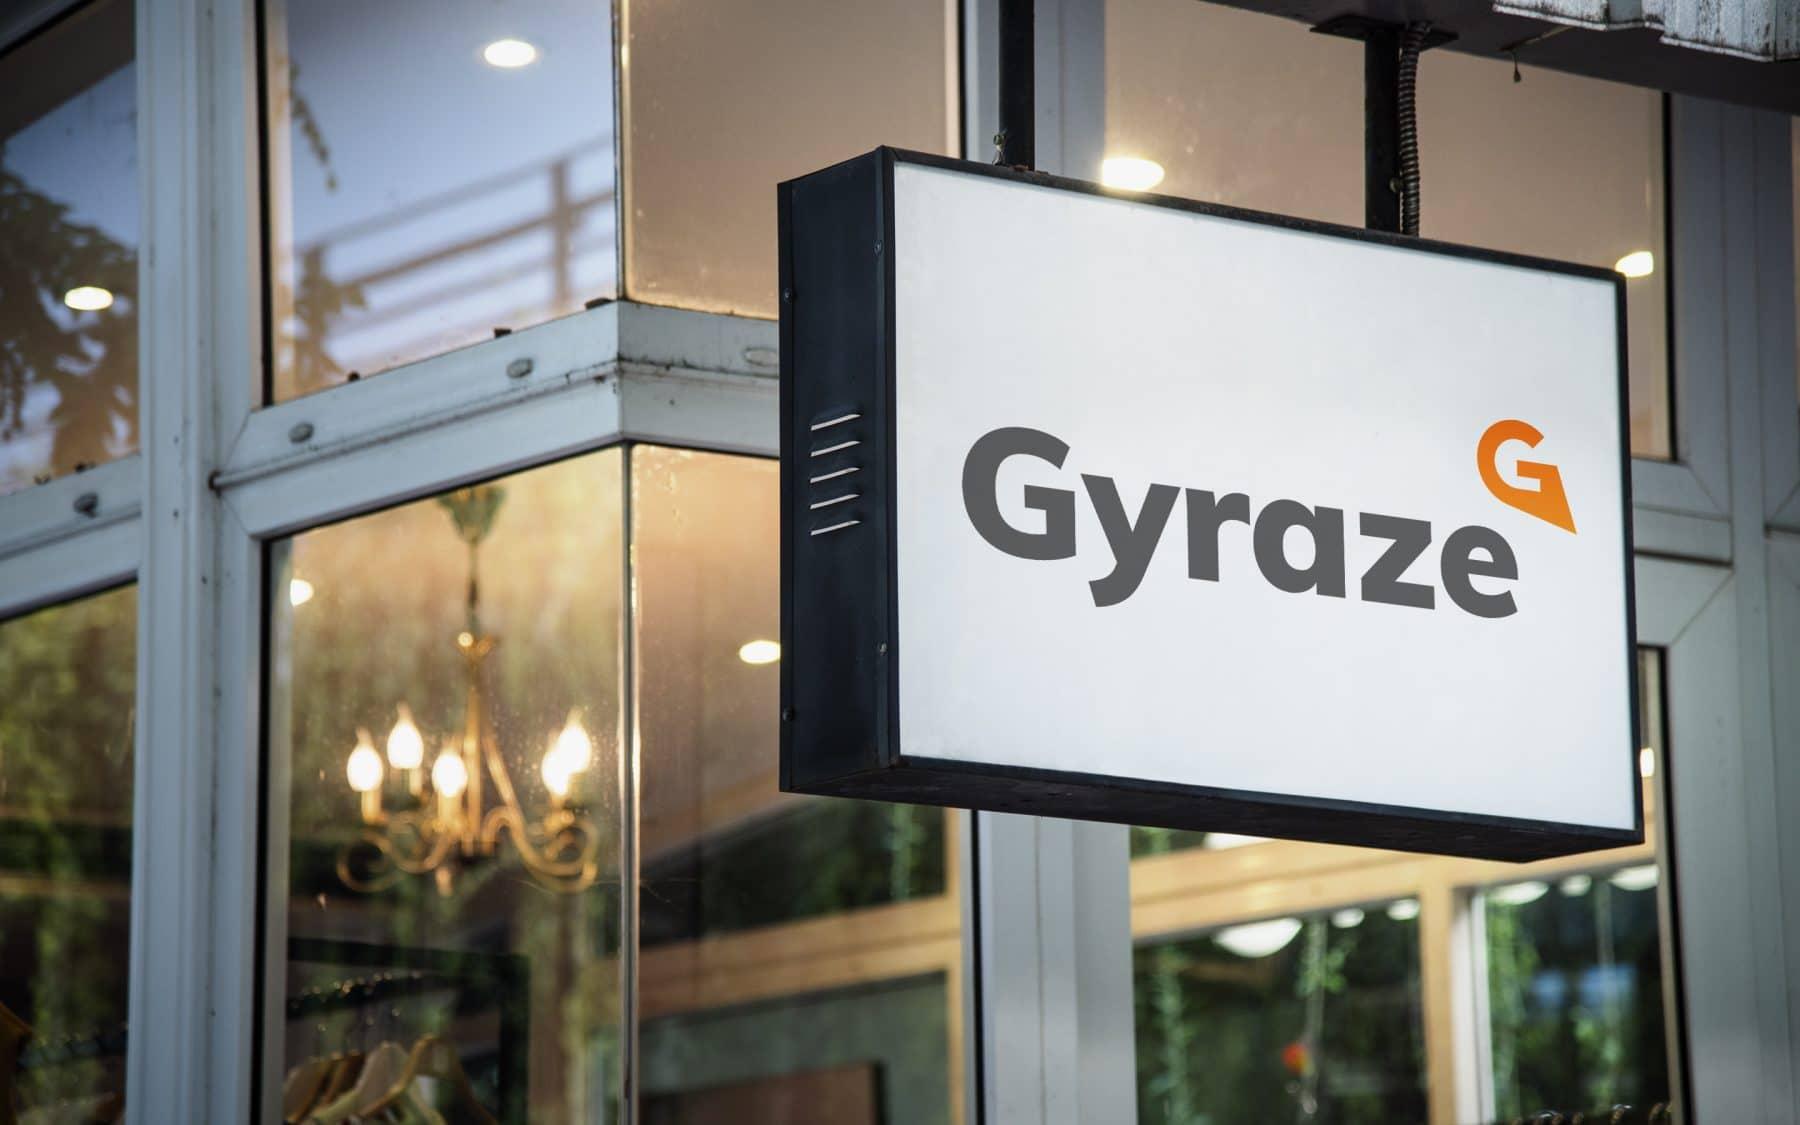 Gyraze